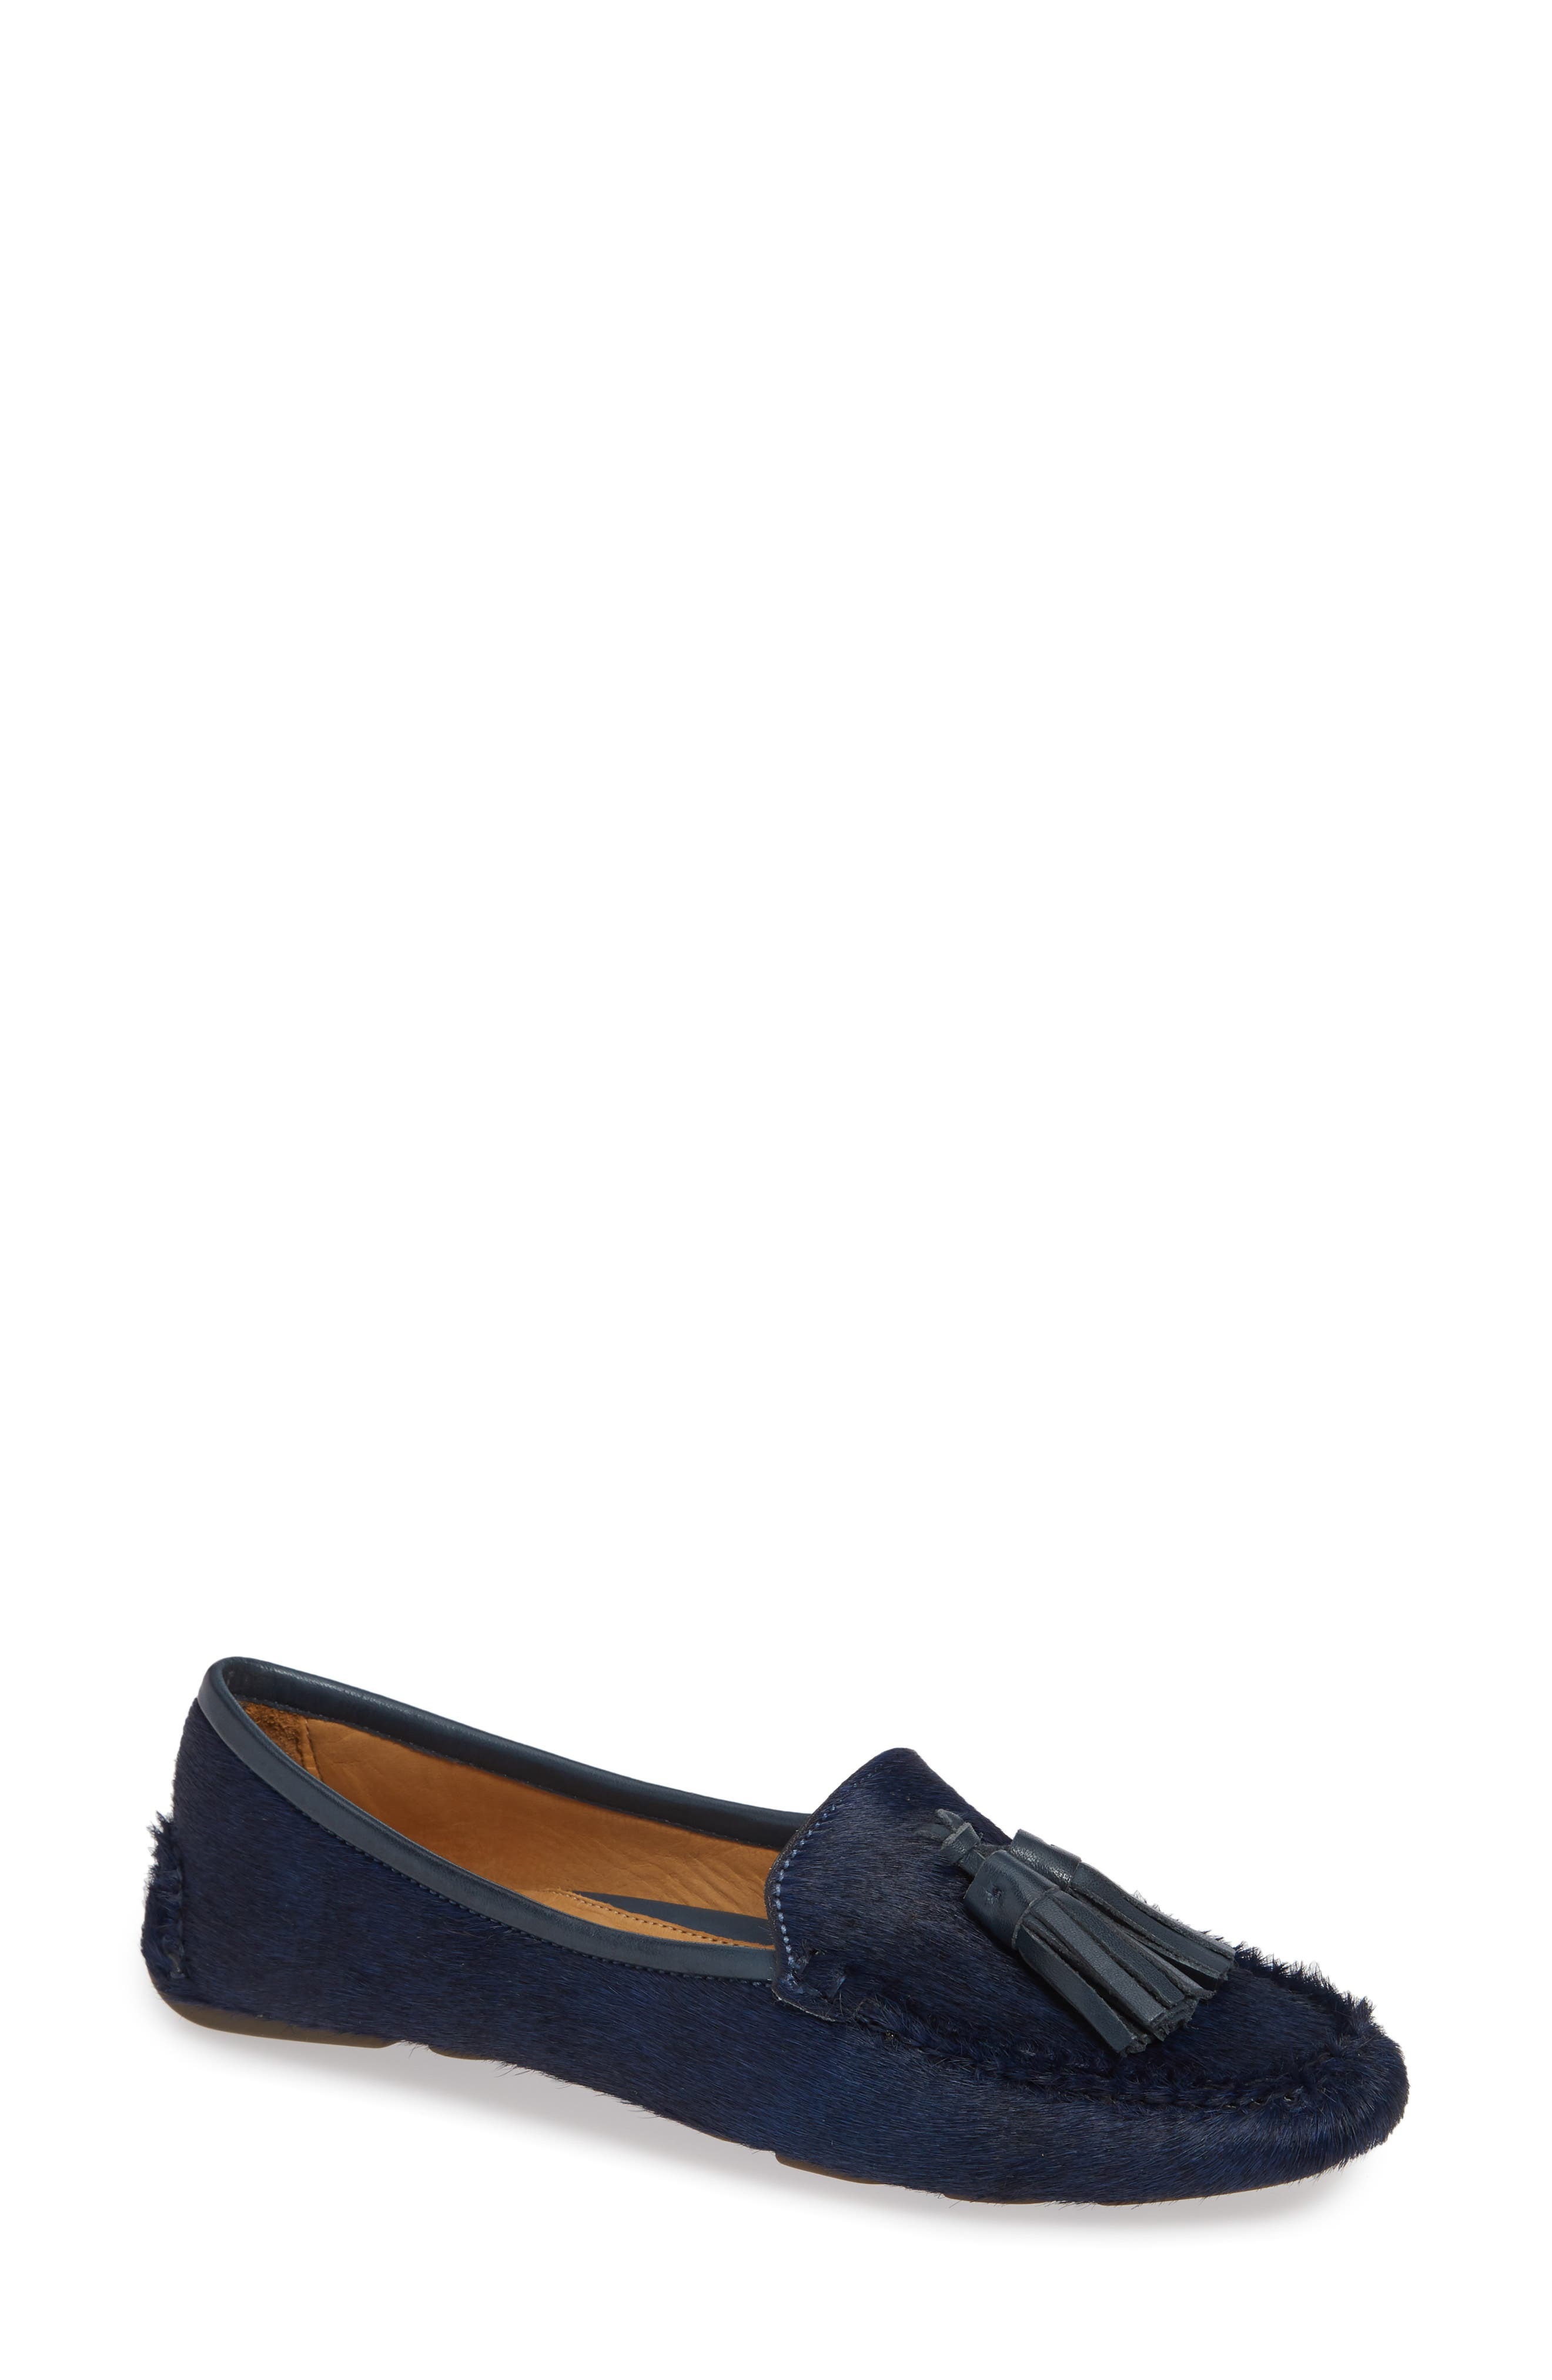 Patricia Green Ricky Genuine Calf Hair Loafer- Blue